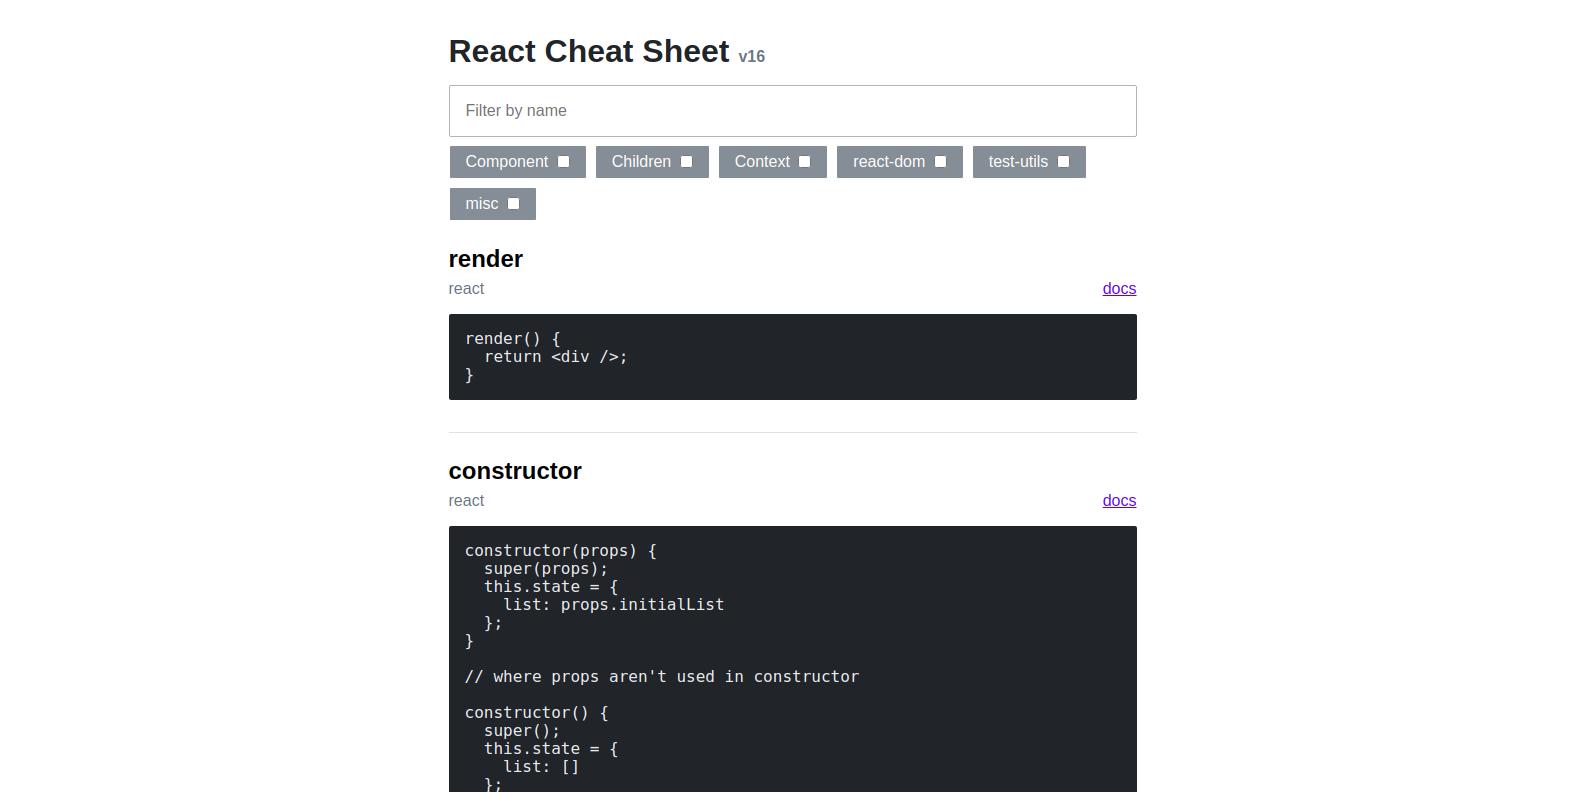 React Cheat Sheet